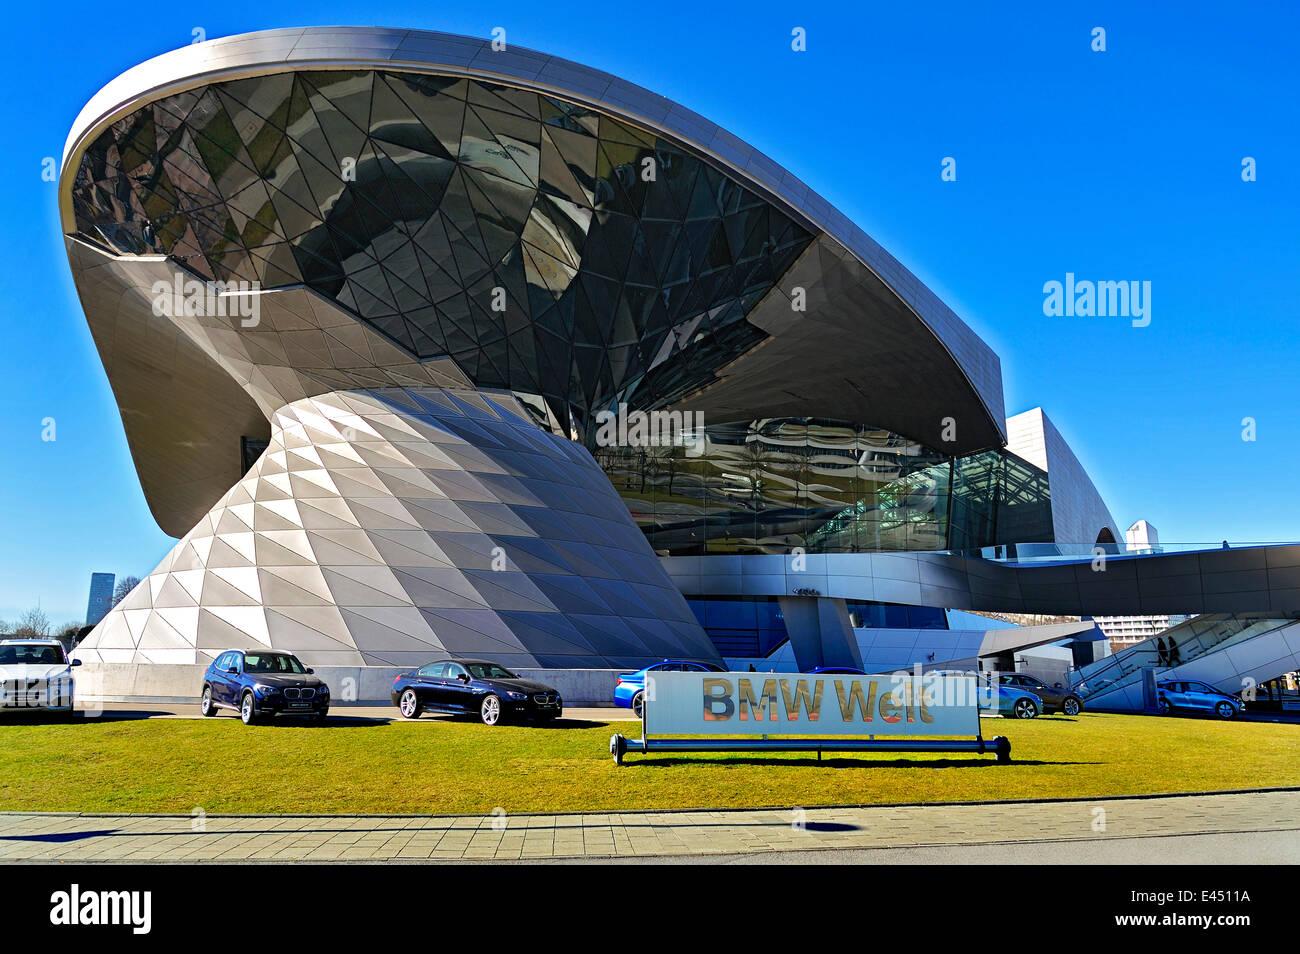 BMW Welt exhibition facility, Munich, Upper Bavaria, Bavaria, Germany - Stock Image